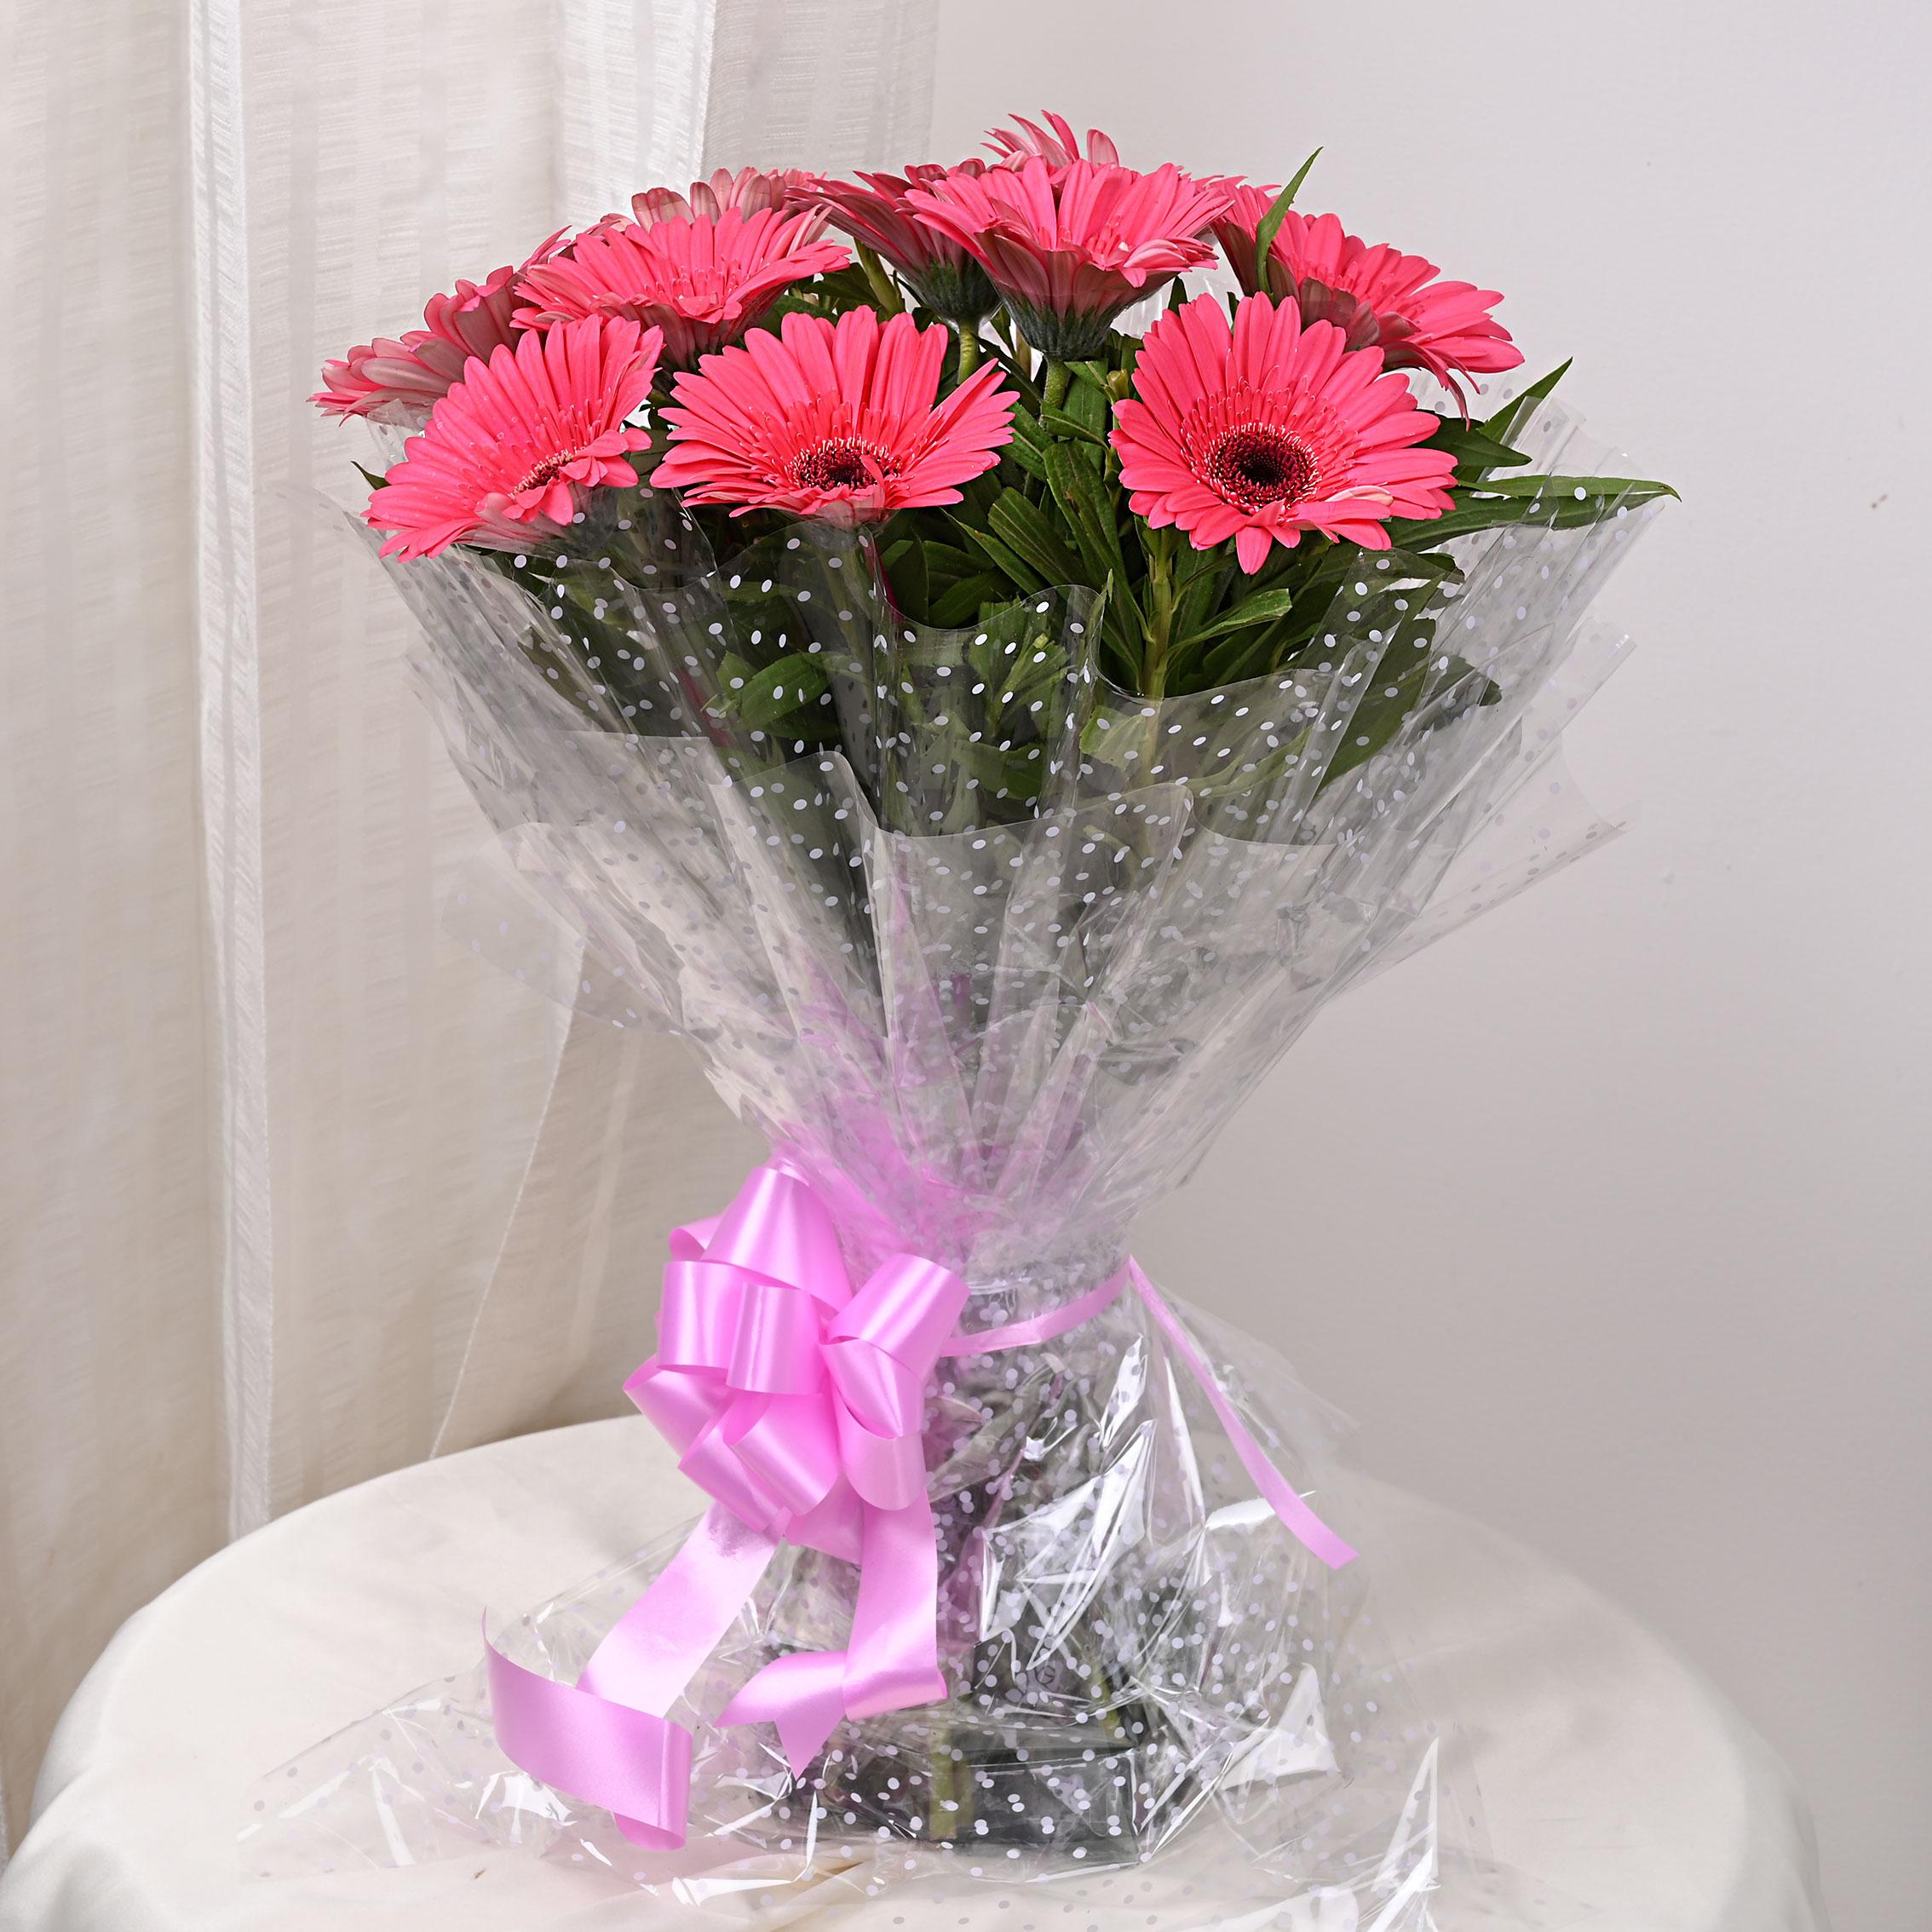 10 Pink Gerberas Bouquet in Beautiful Packaging